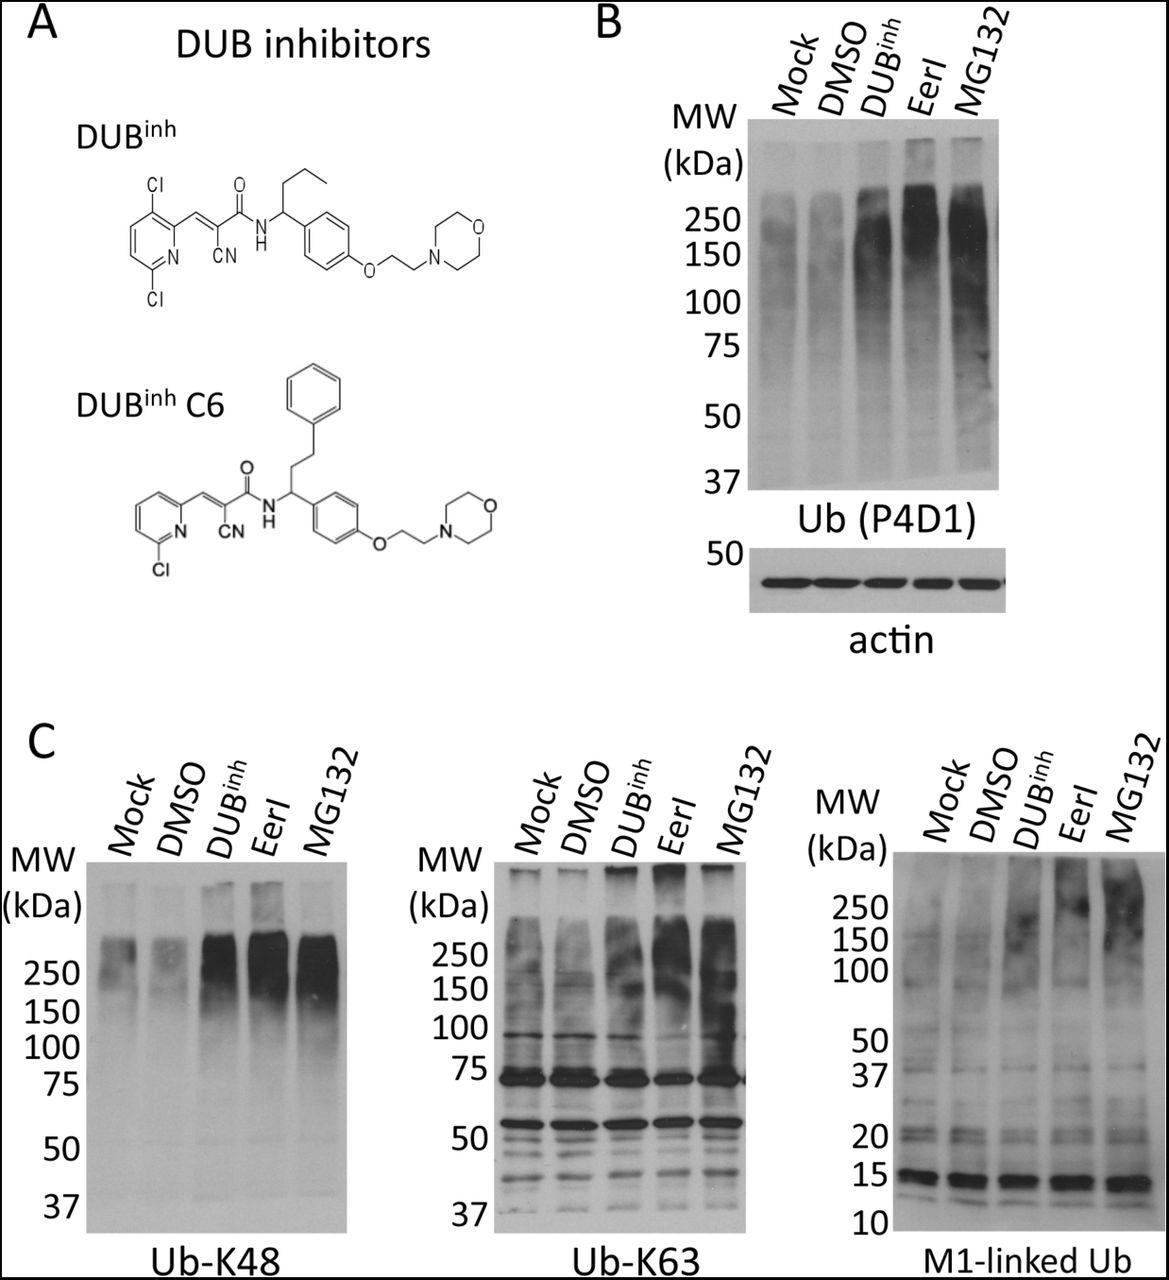 Perturbation of ubiquitin homeostasis promotes macrophage